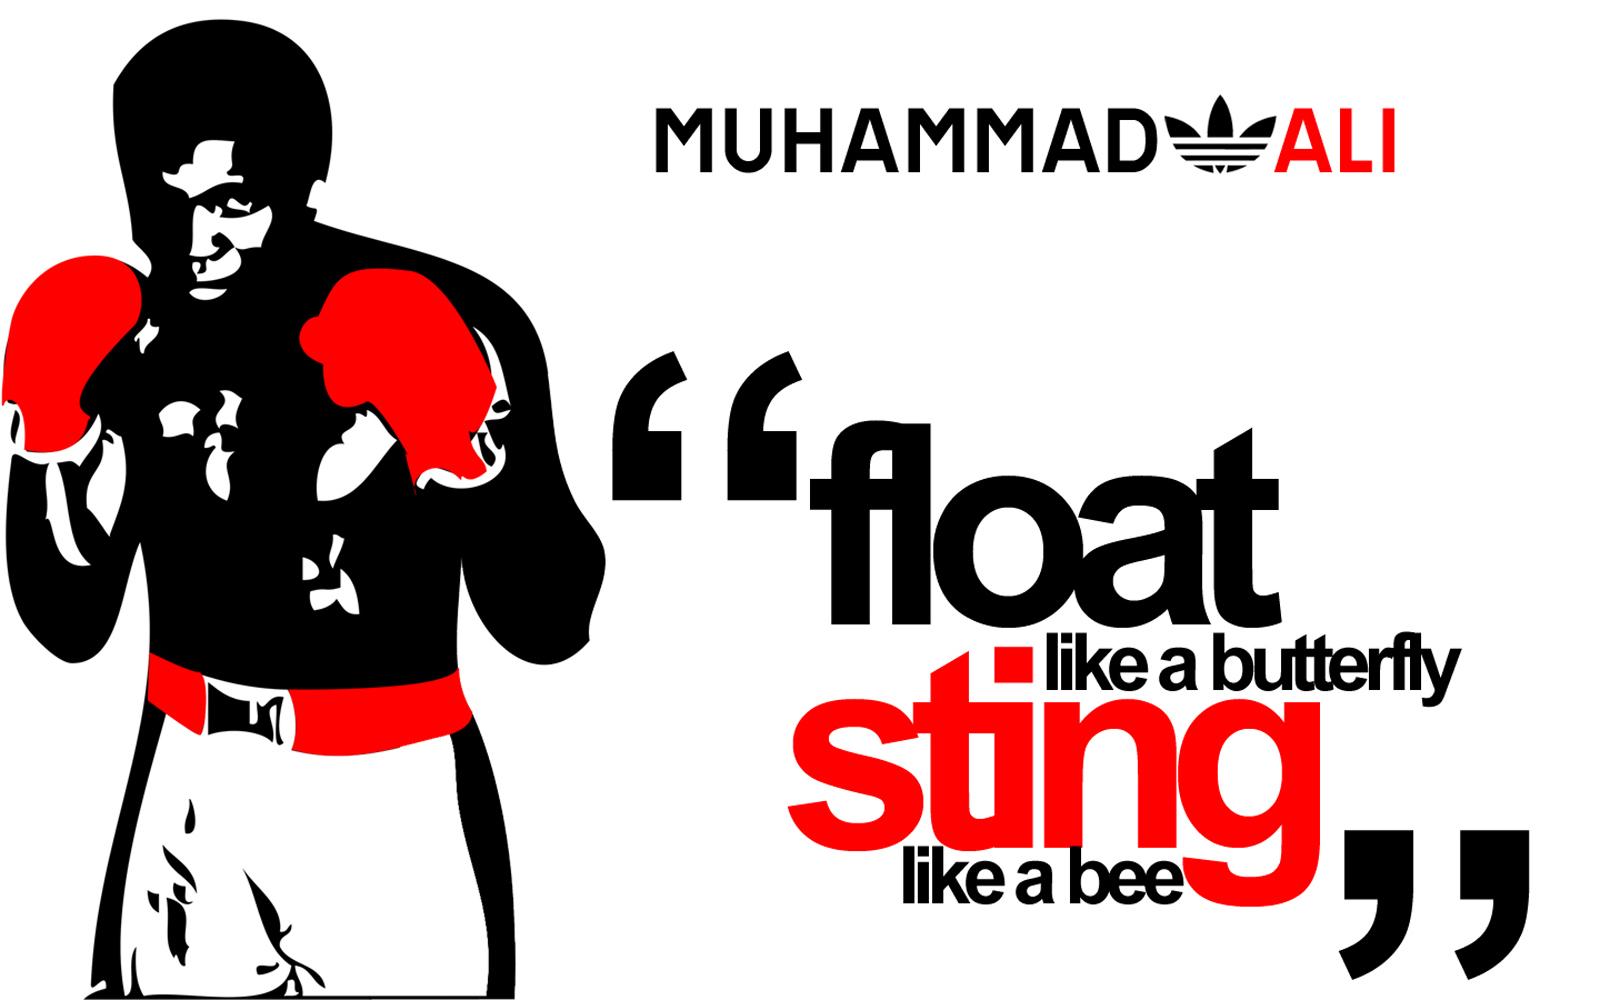 Muhammad Ali Quote Wallpaper Desktop Wallpaper with 1600x1000 1600x1000